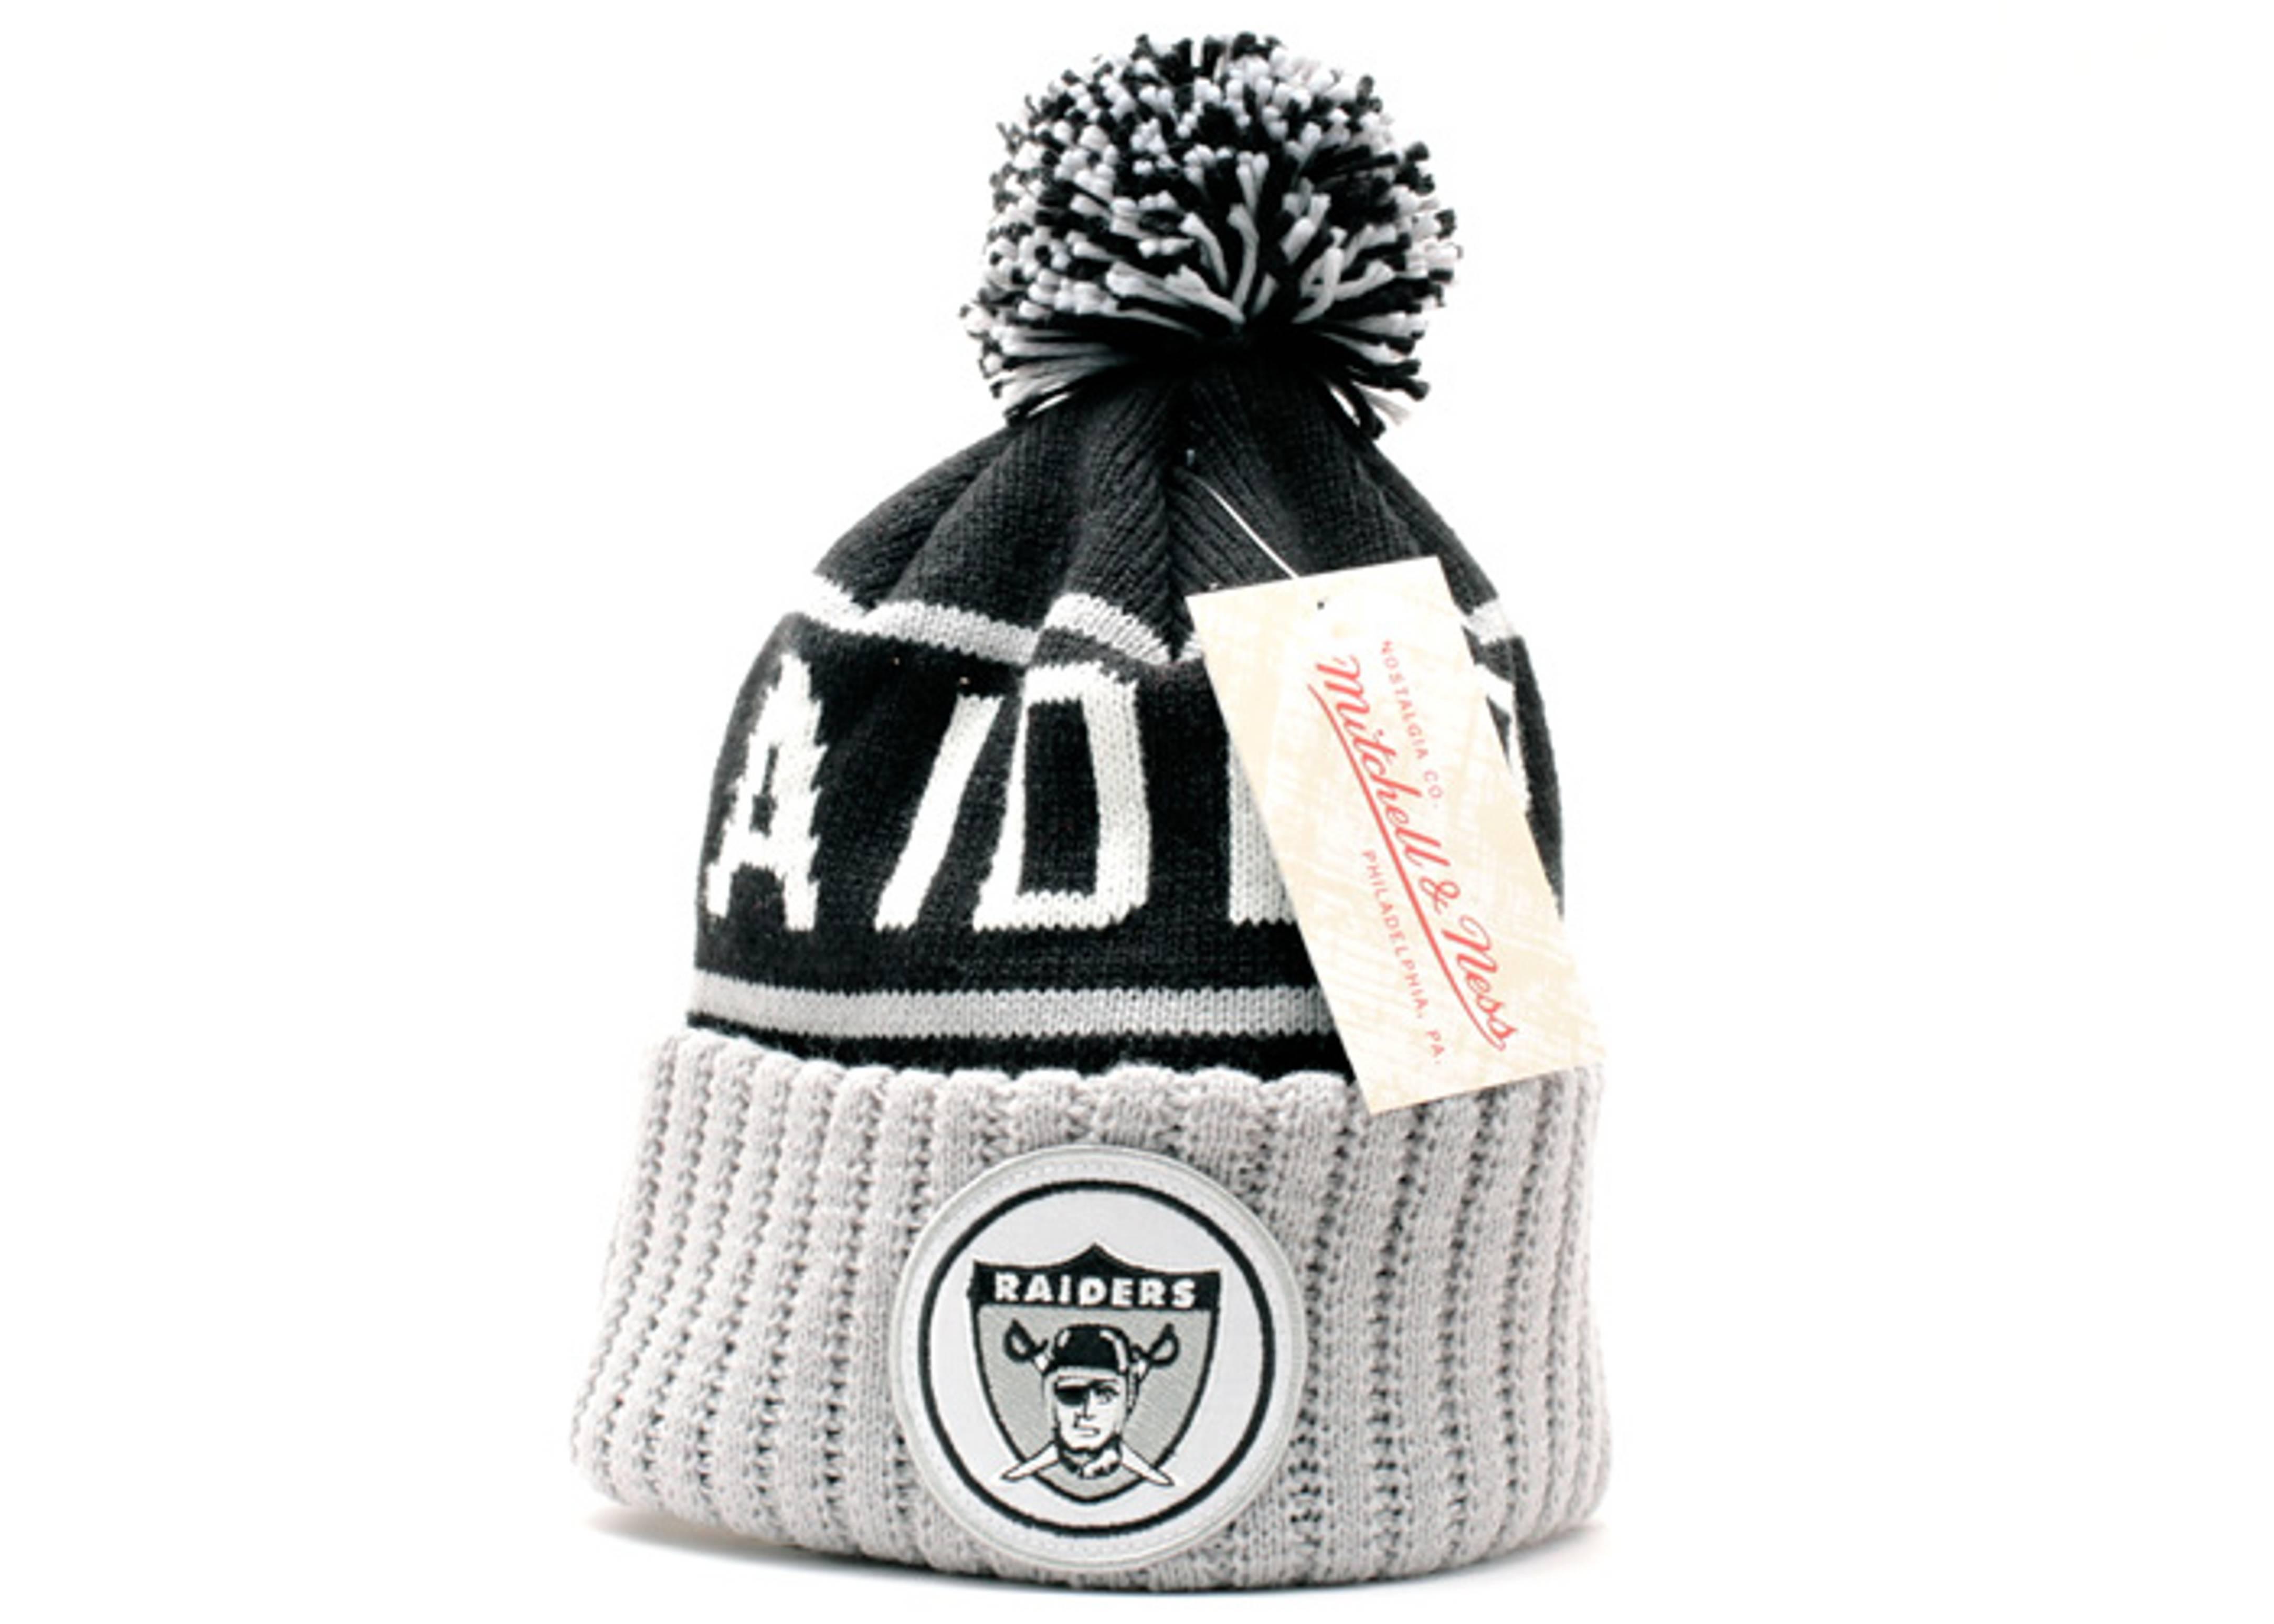 a6c2671e53c Oakland Raiders Cuffed Pom Knit Beanie - Mitchell   Ness - kj48mtc6raide -  black grey